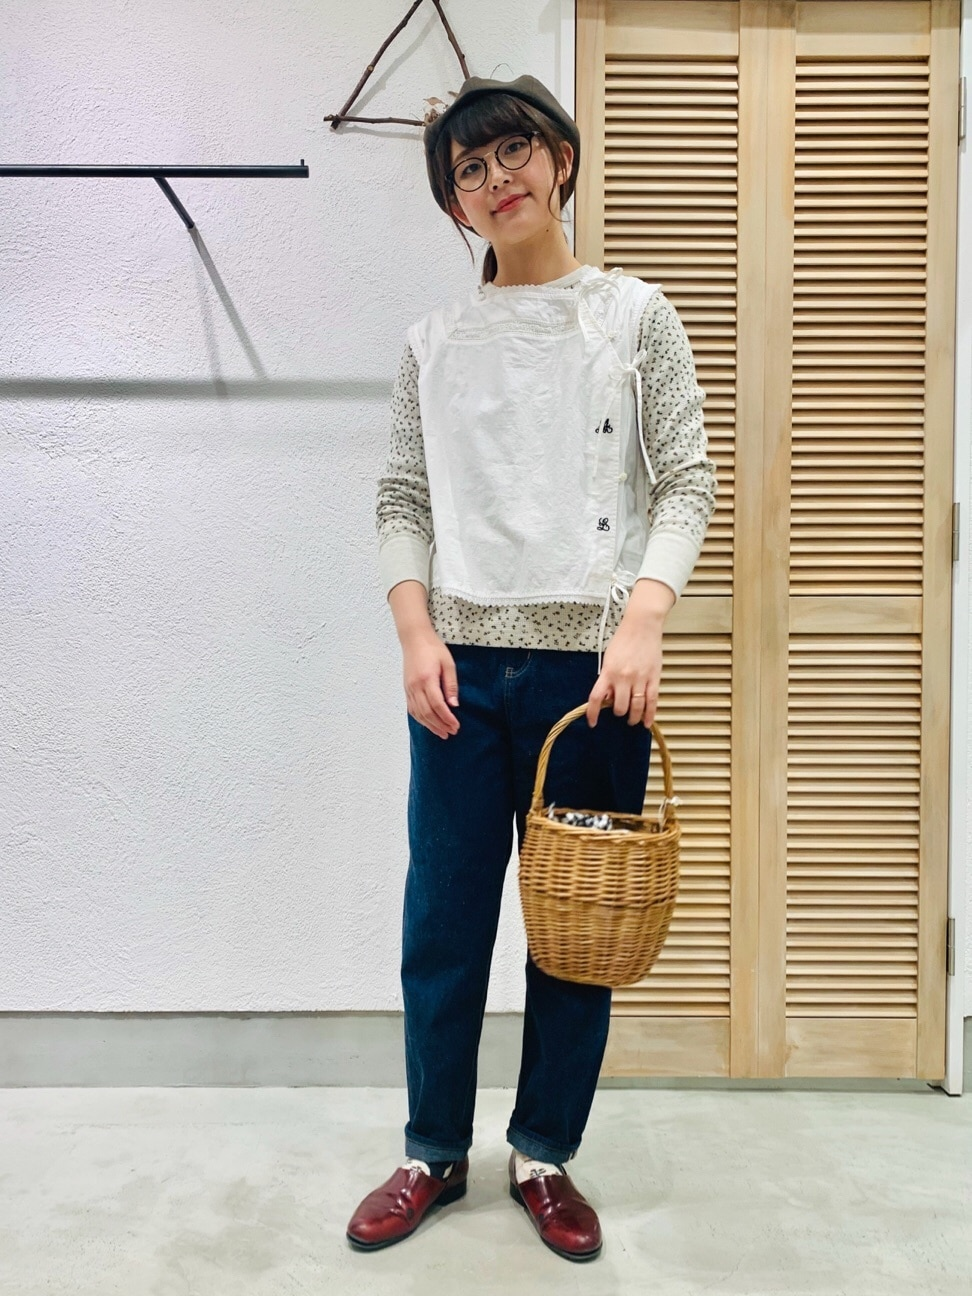 chambre de charme 横浜ジョイナス 身長:162cm 2021.01.15